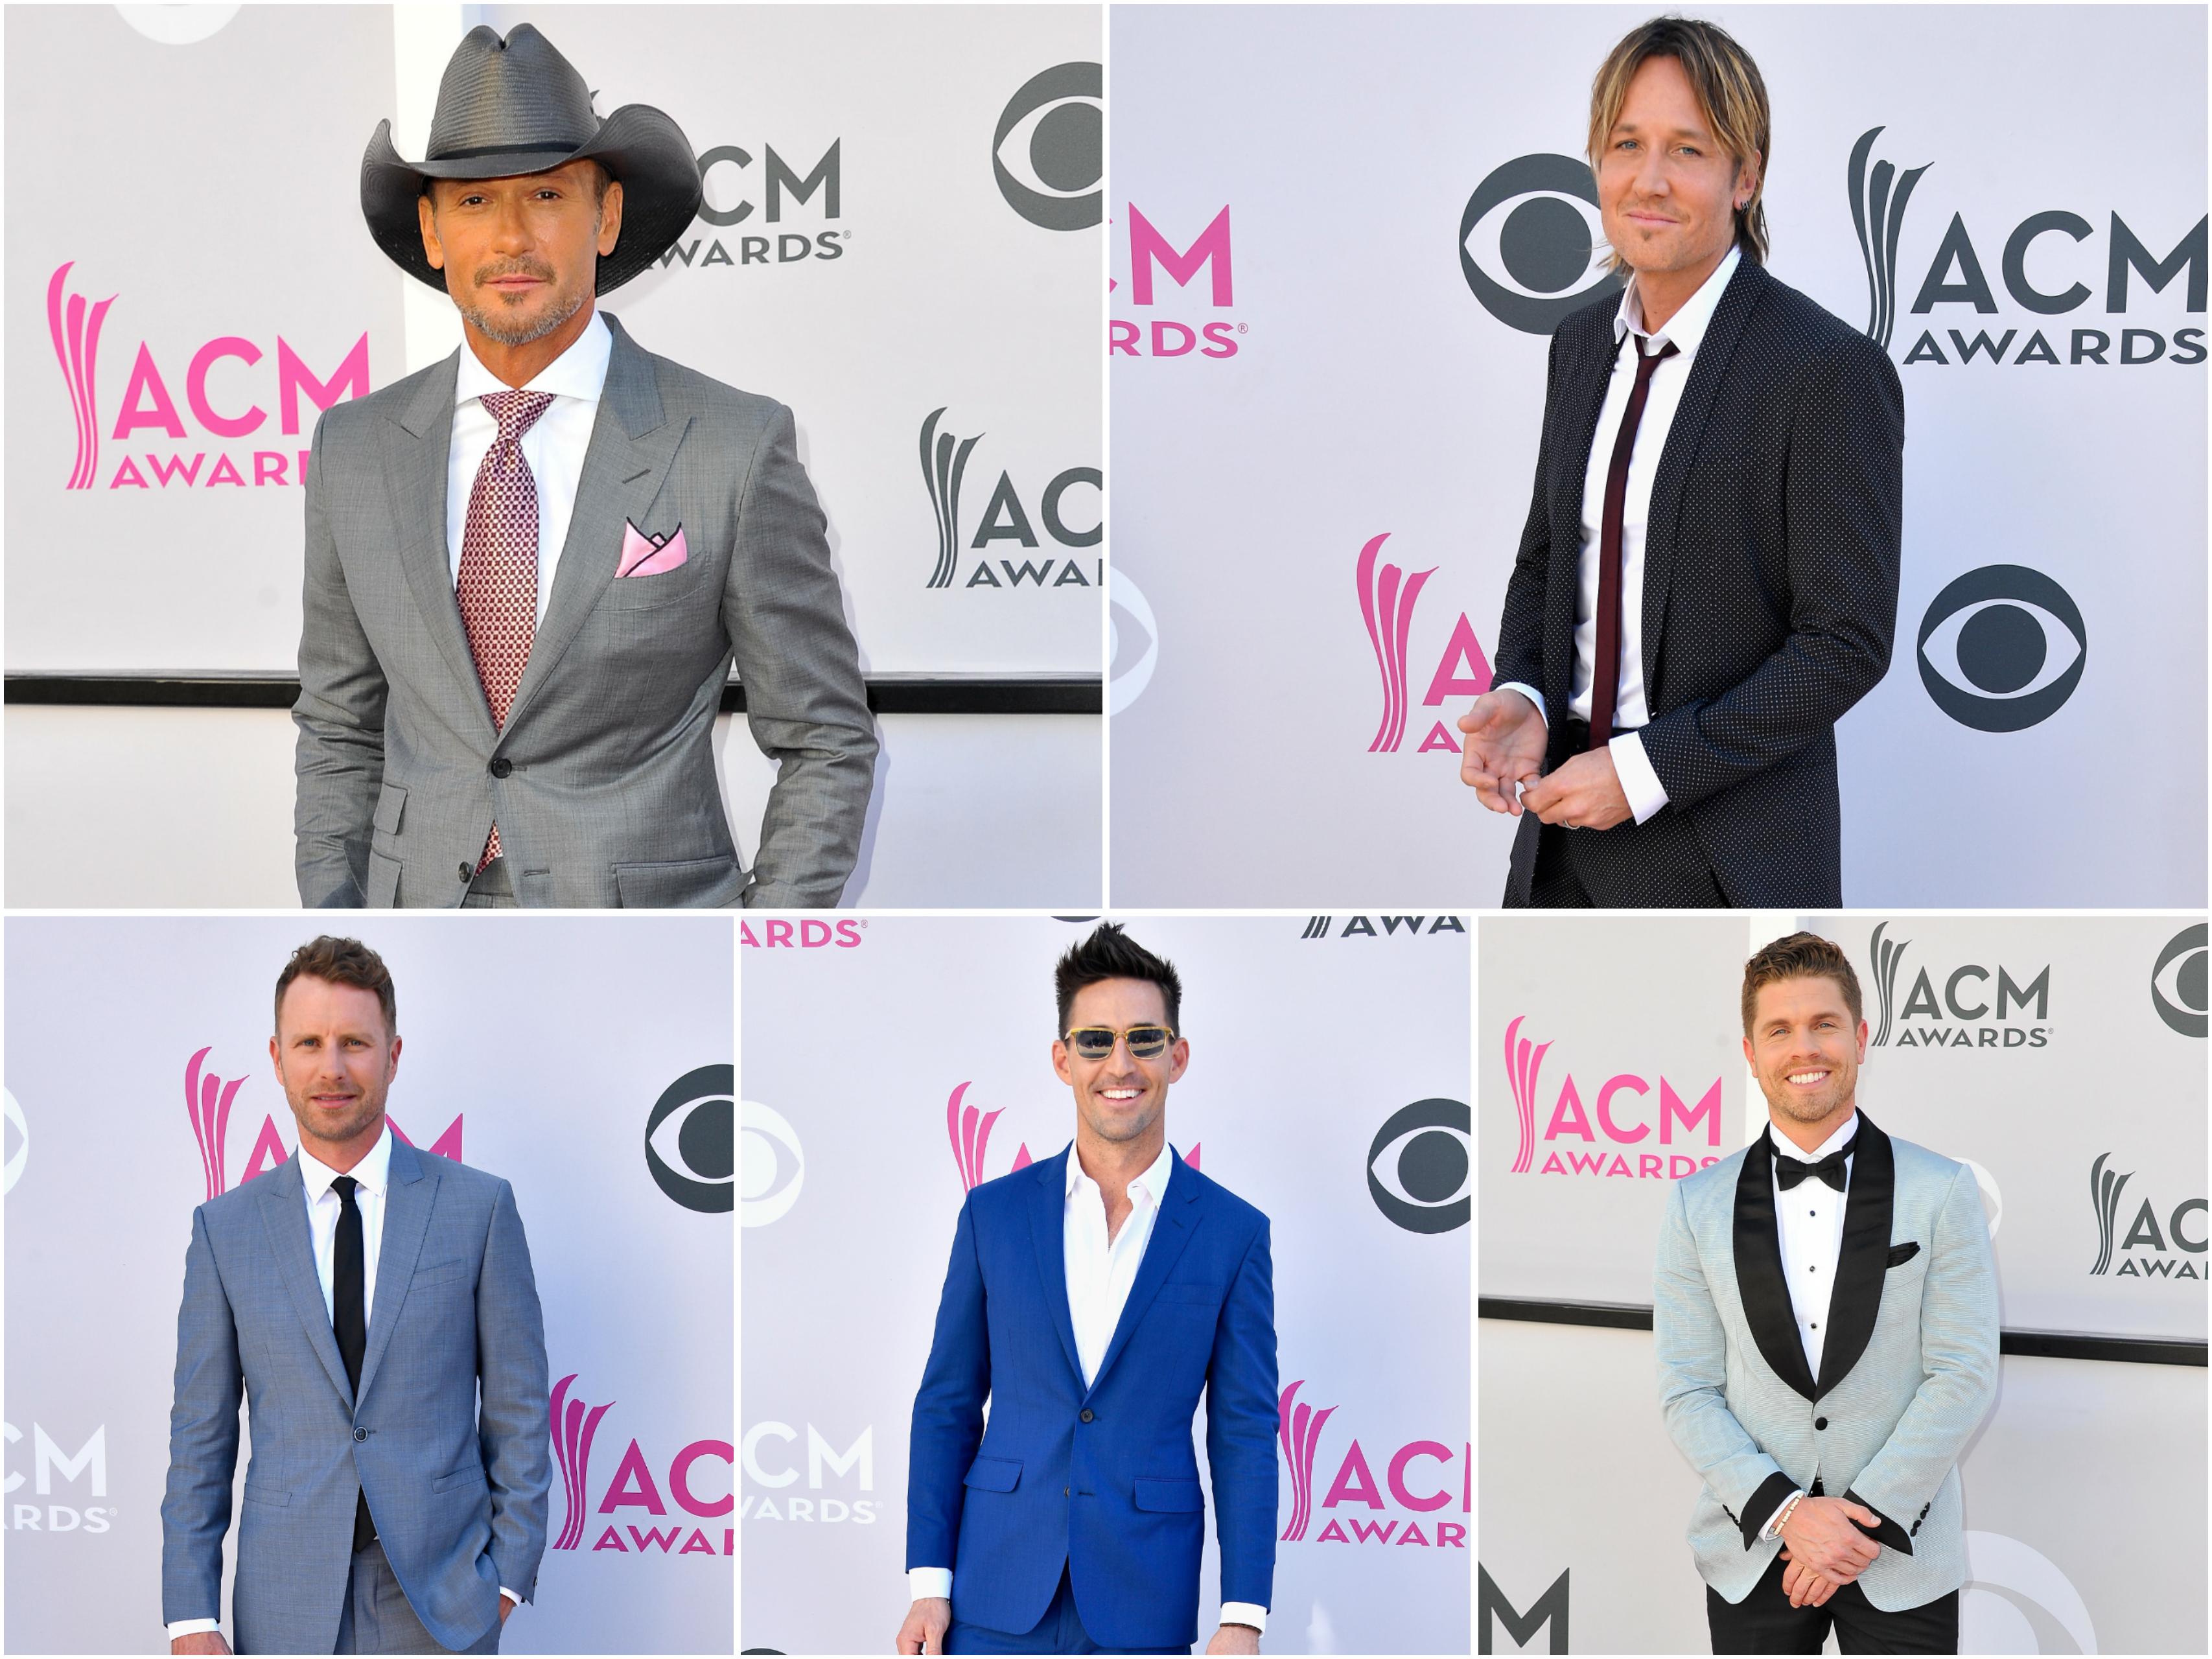 Tim McGraw, Keith Urban, Dierks Bentley, Jake Owen, Dustin Lynch; Photos by Getty Images